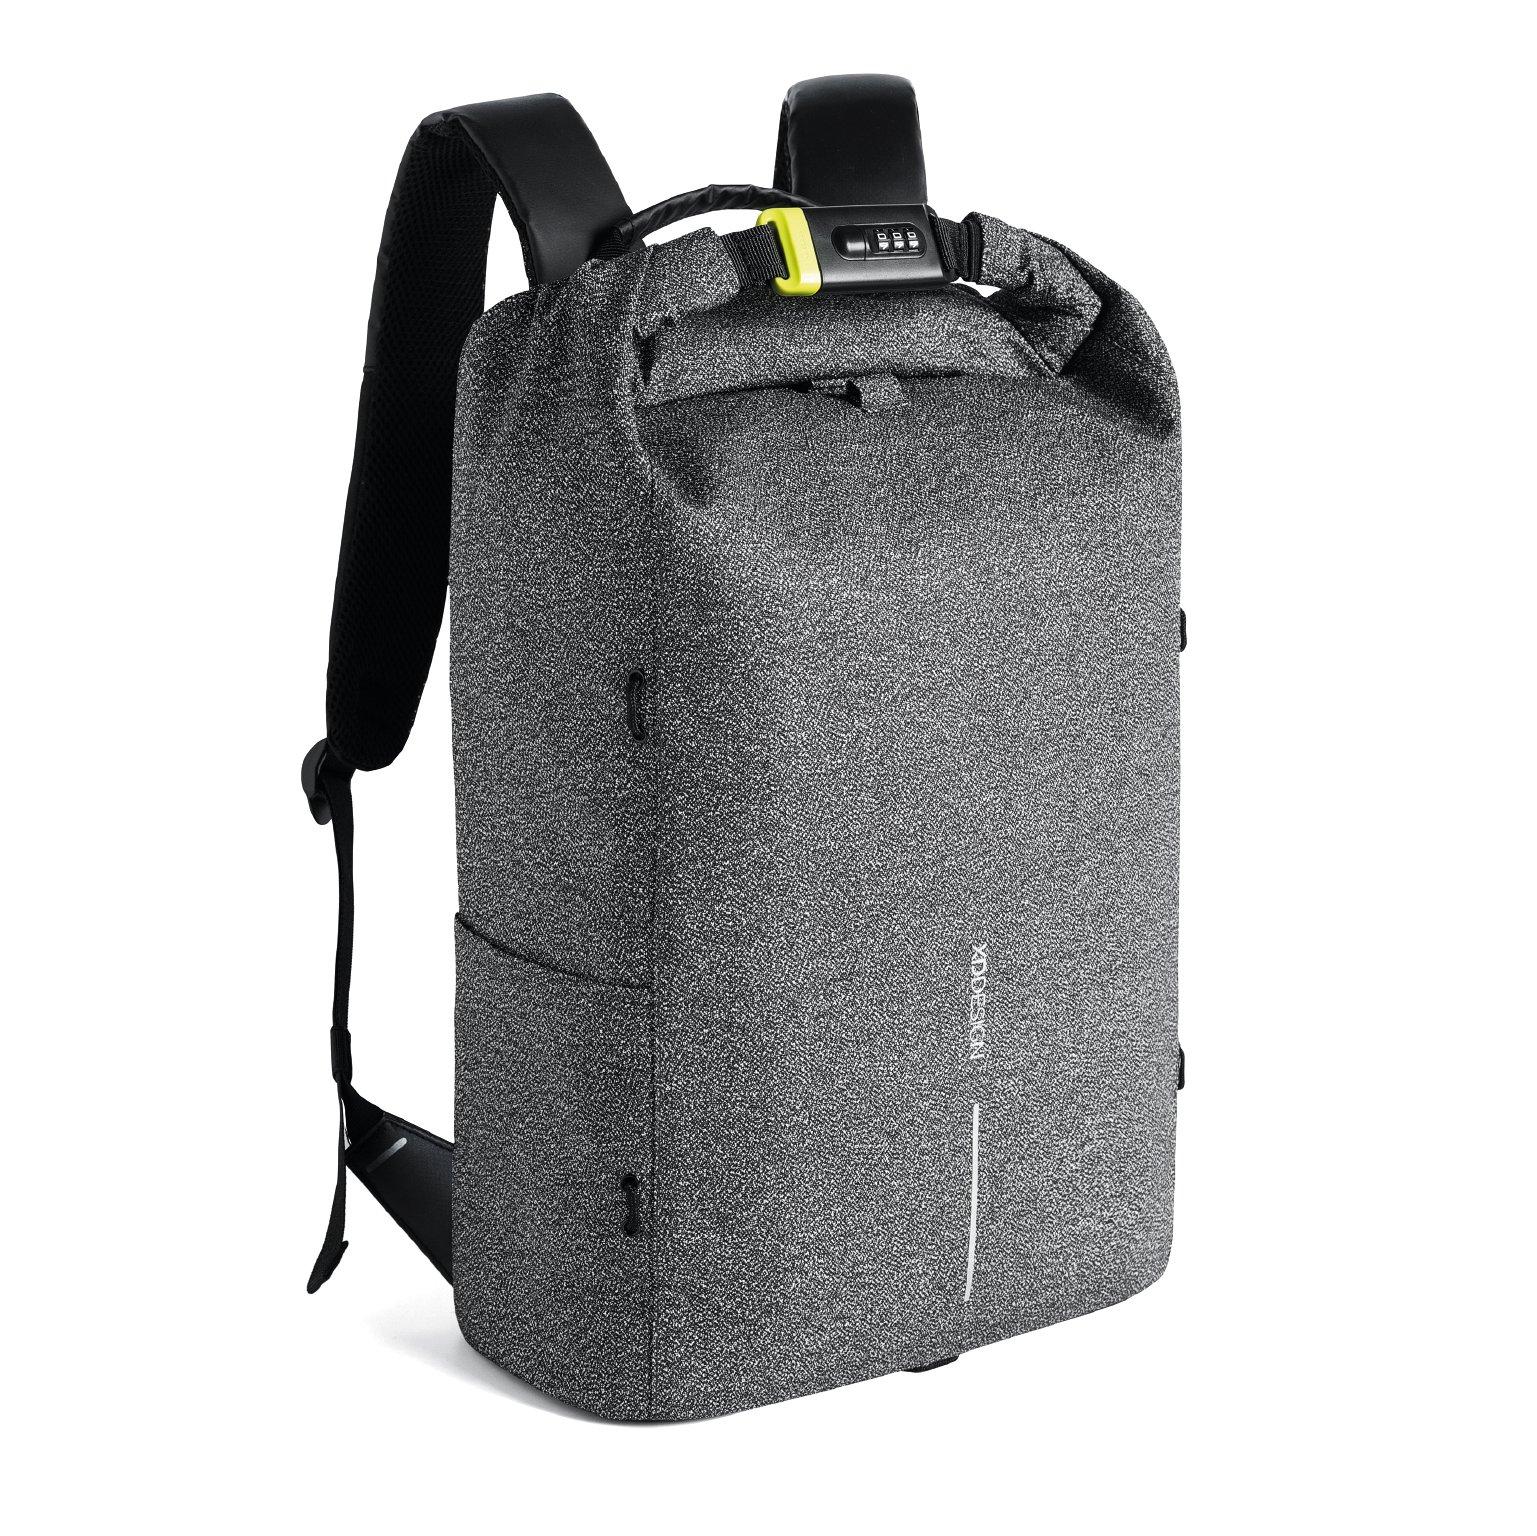 XD Design - Bobby Urban Anti-Theft-Backpack - Grey (P705.642)